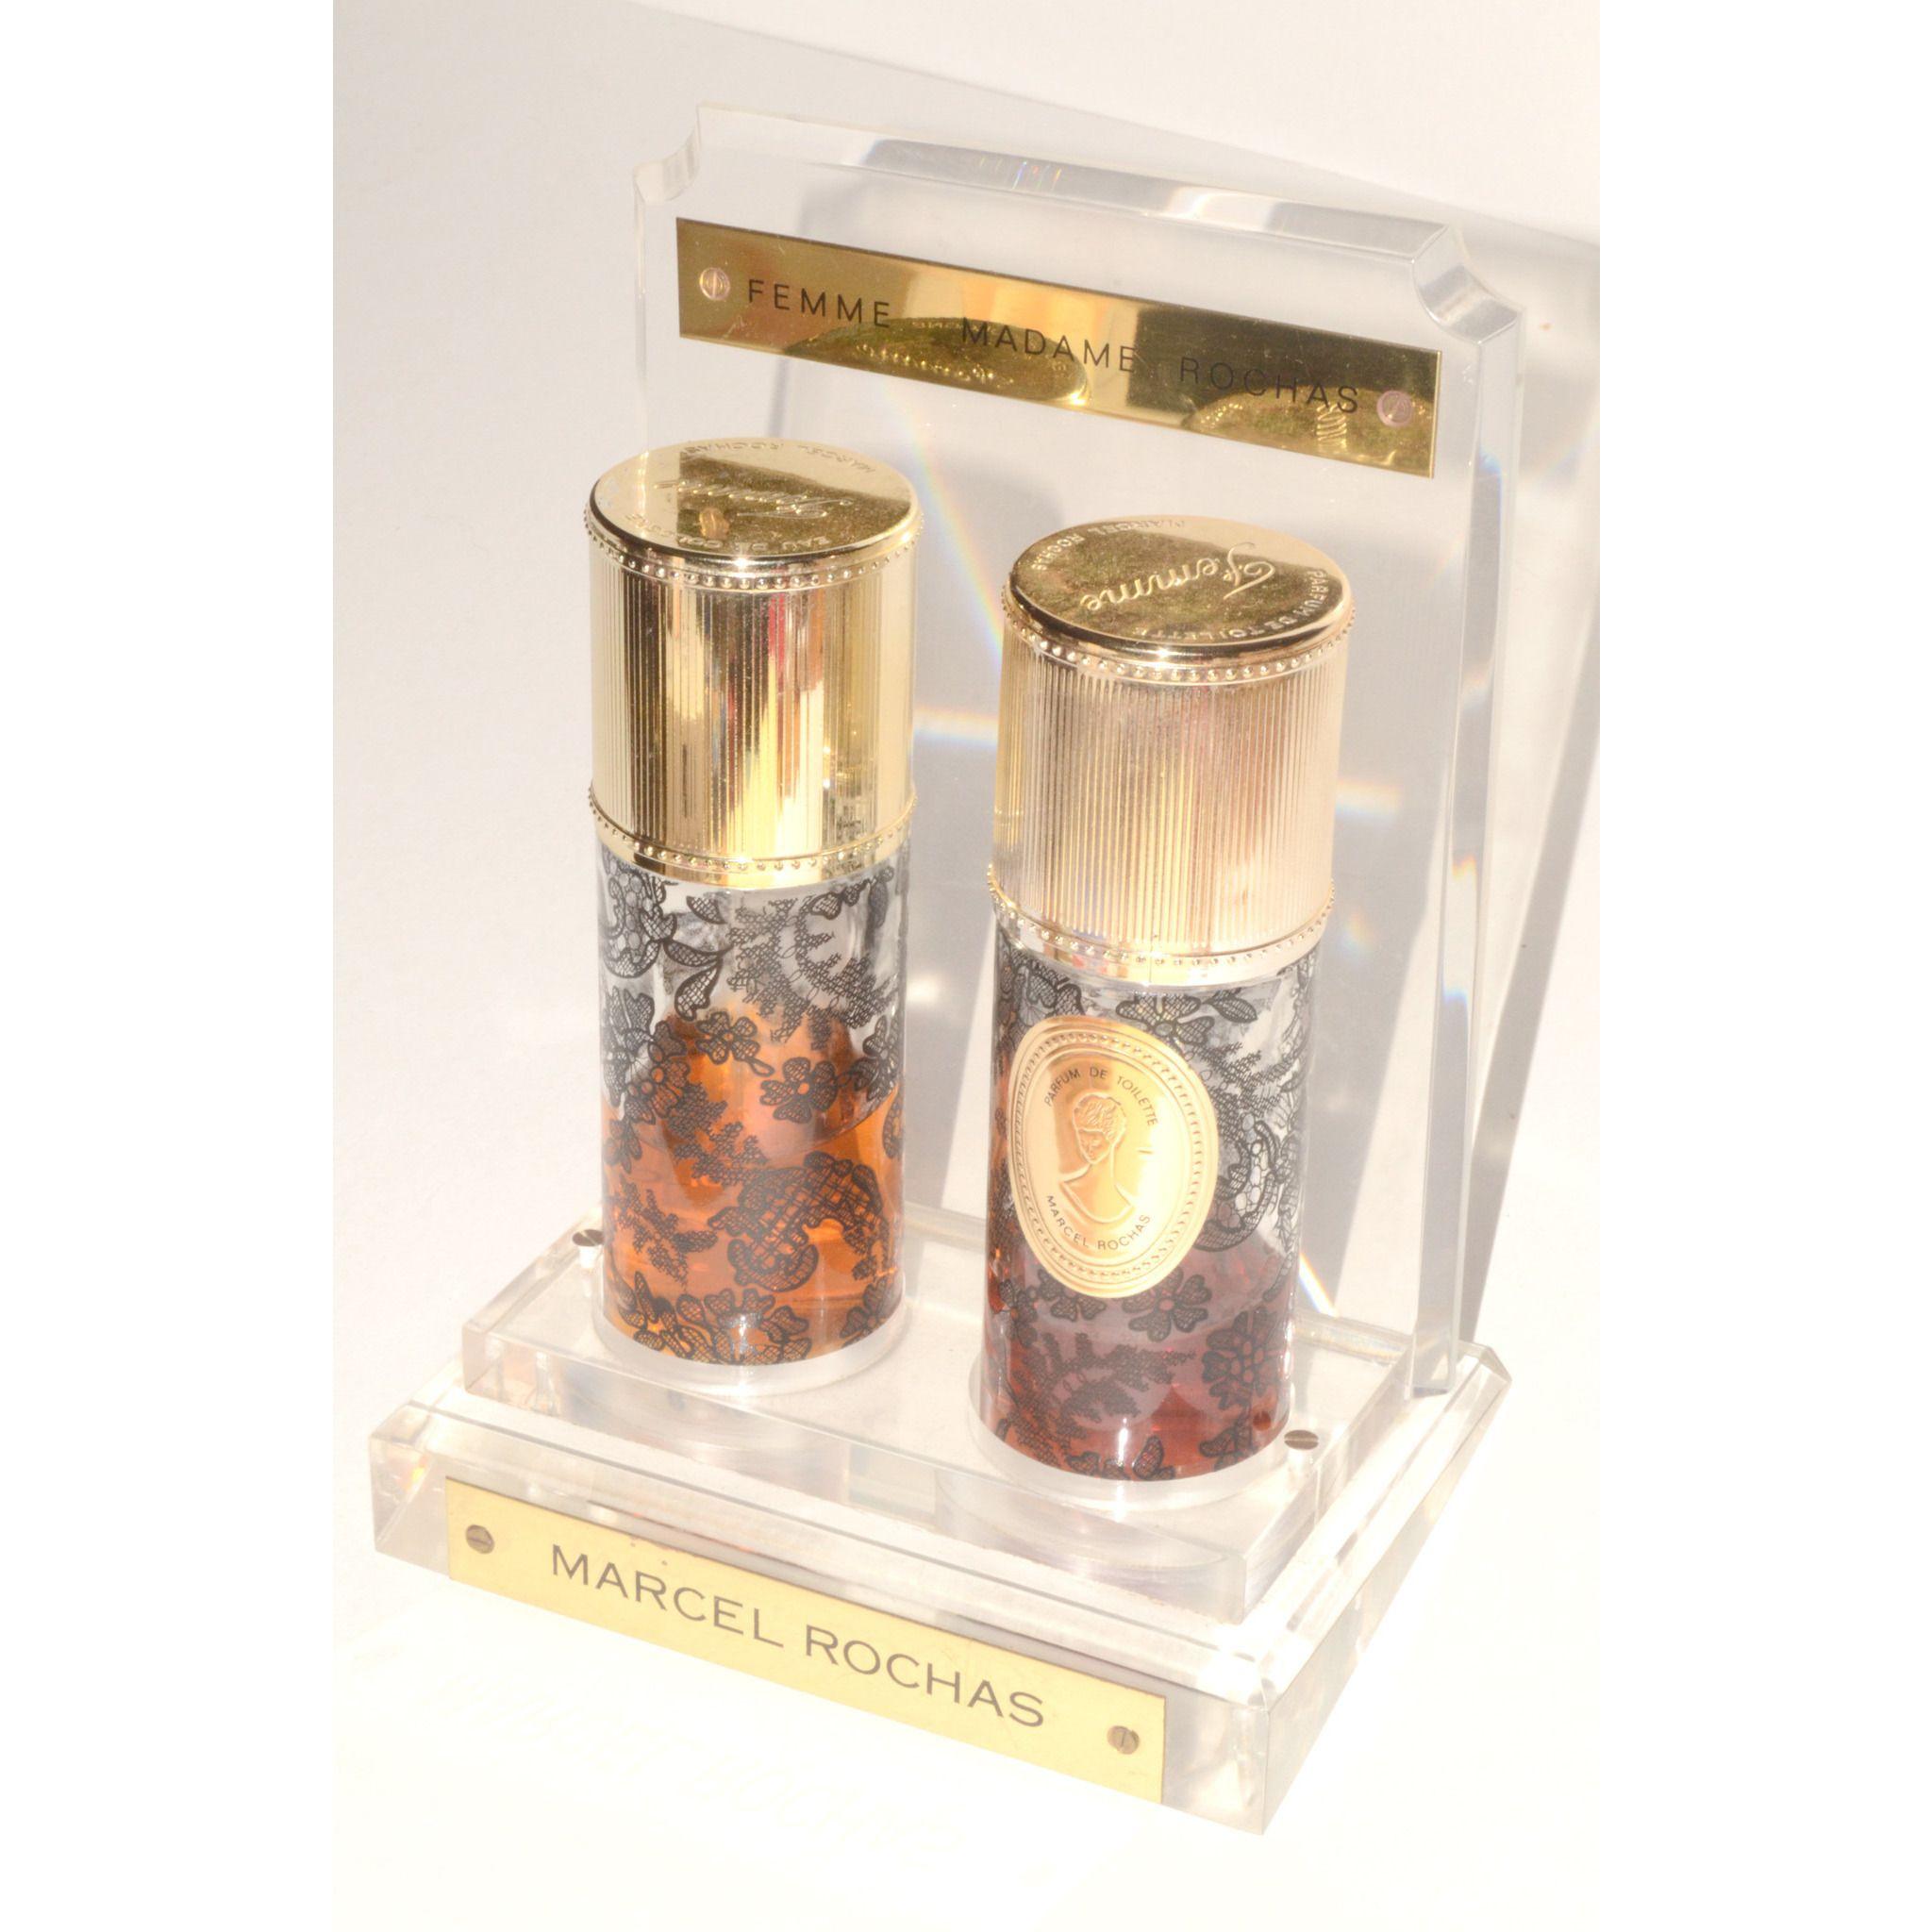 Femme Perfume Display Set By Marcel Rochas